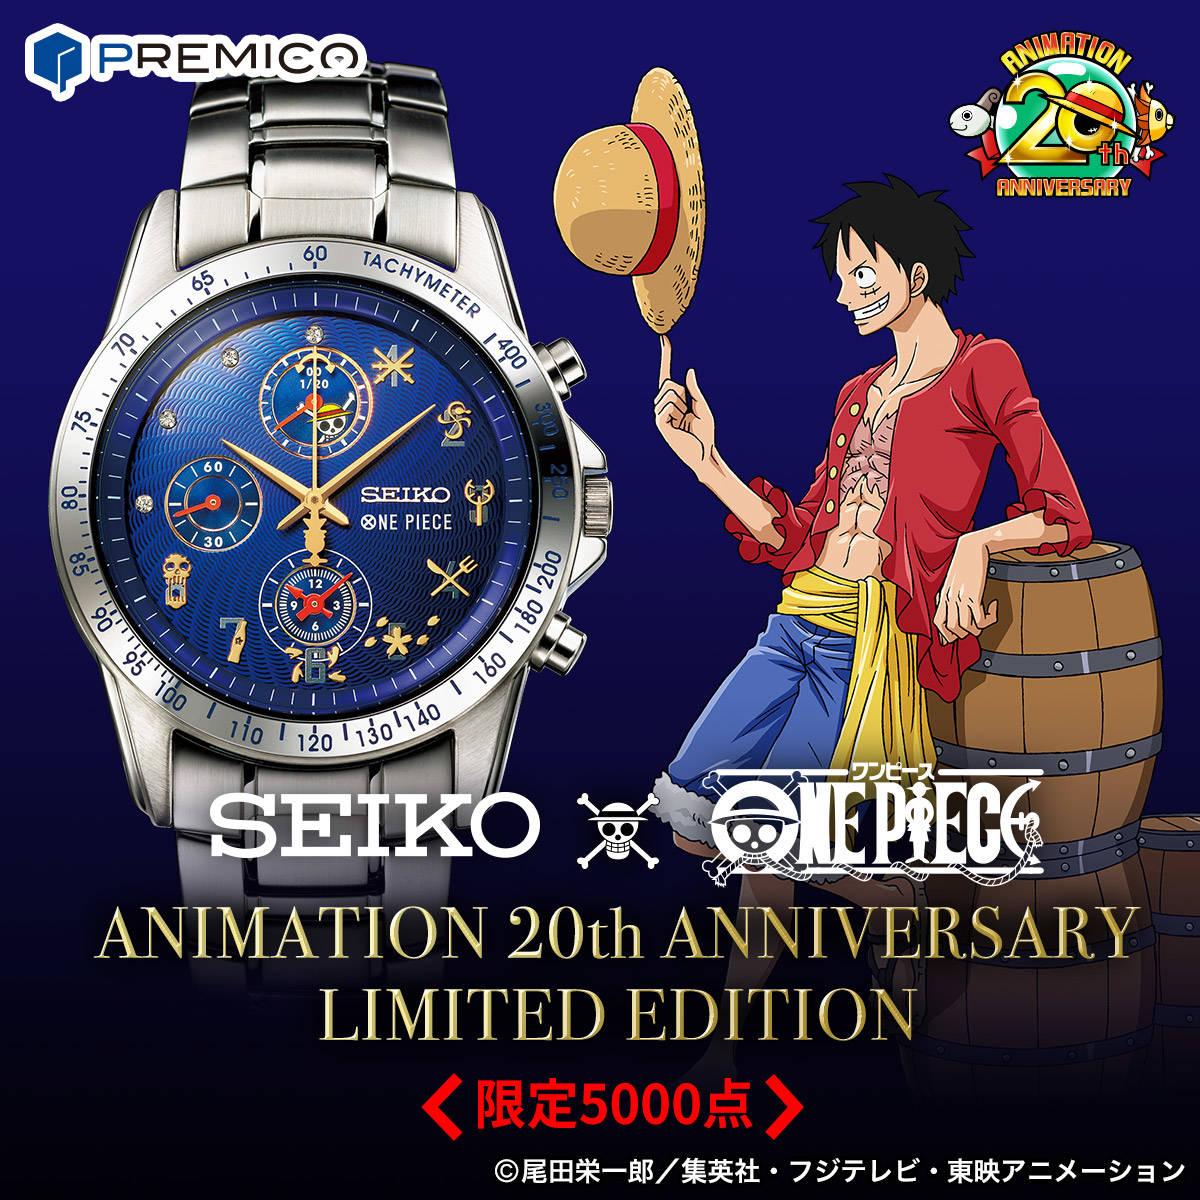 『ONE PIECE』セイコーコラボ腕時計、キャンセル分が数量限定で再販中!7